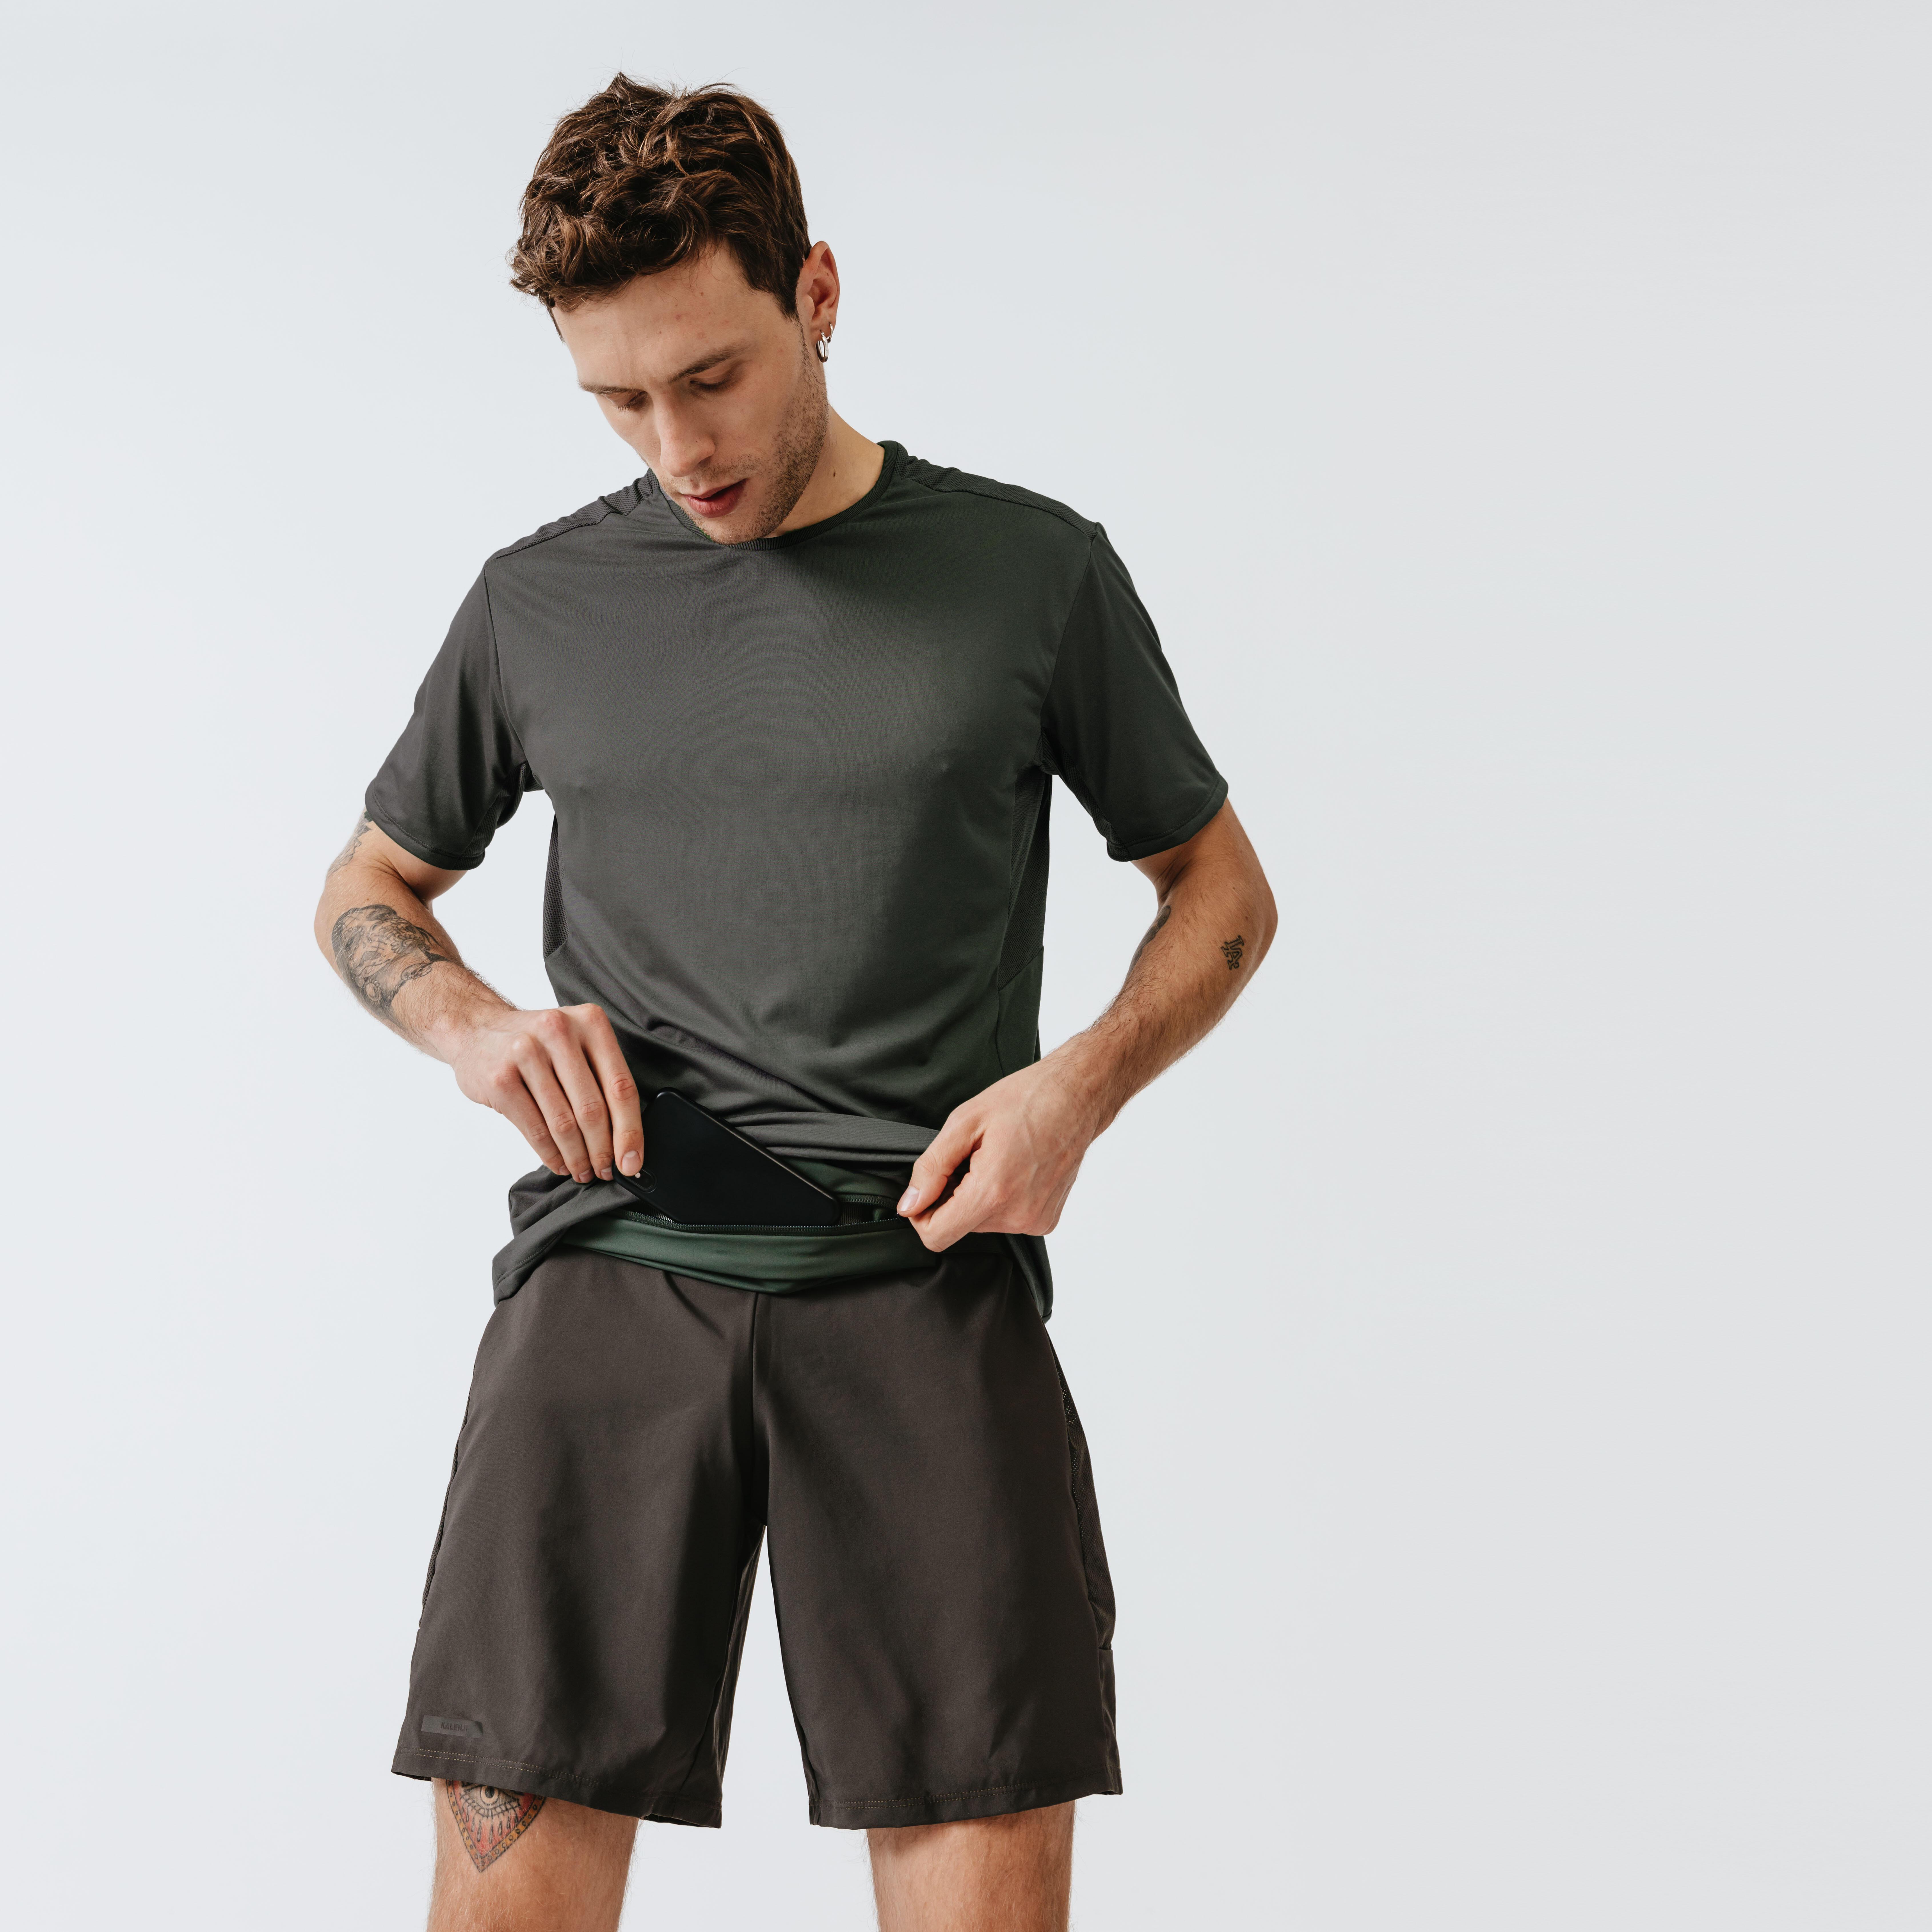 Tricou Jogging Dry+ Bărbați imagine